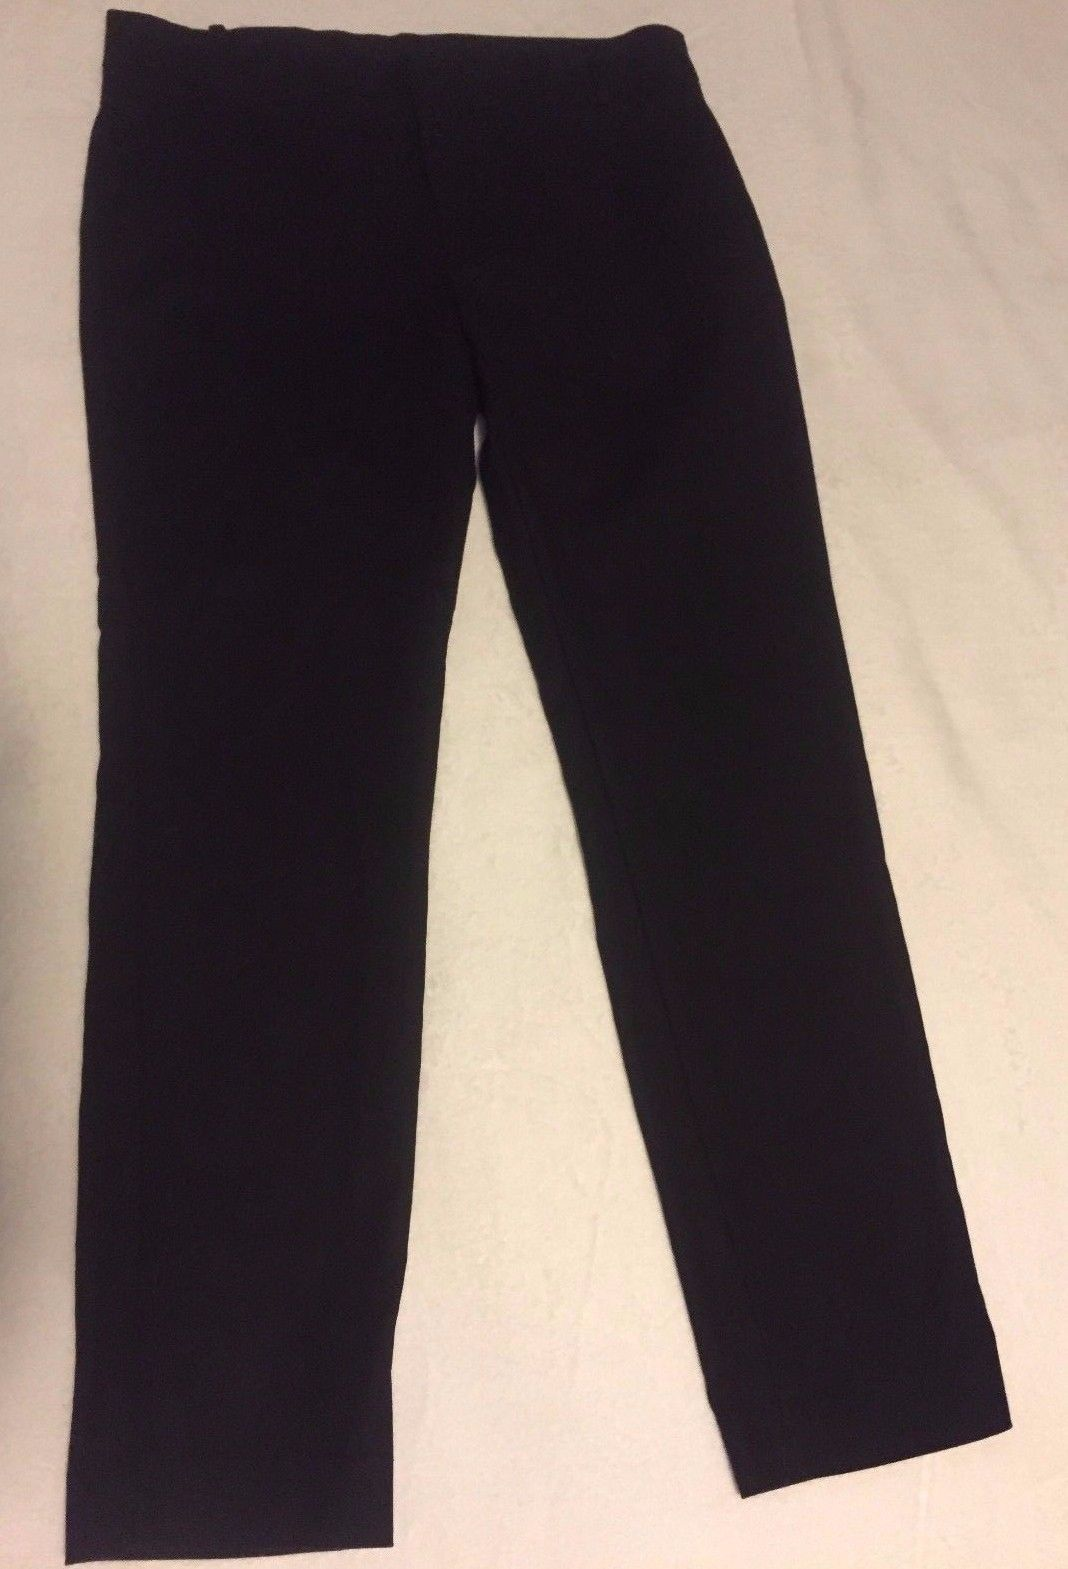 c1f4da46 Zara Basic Women Black Regular Rise Front and 14 similar items